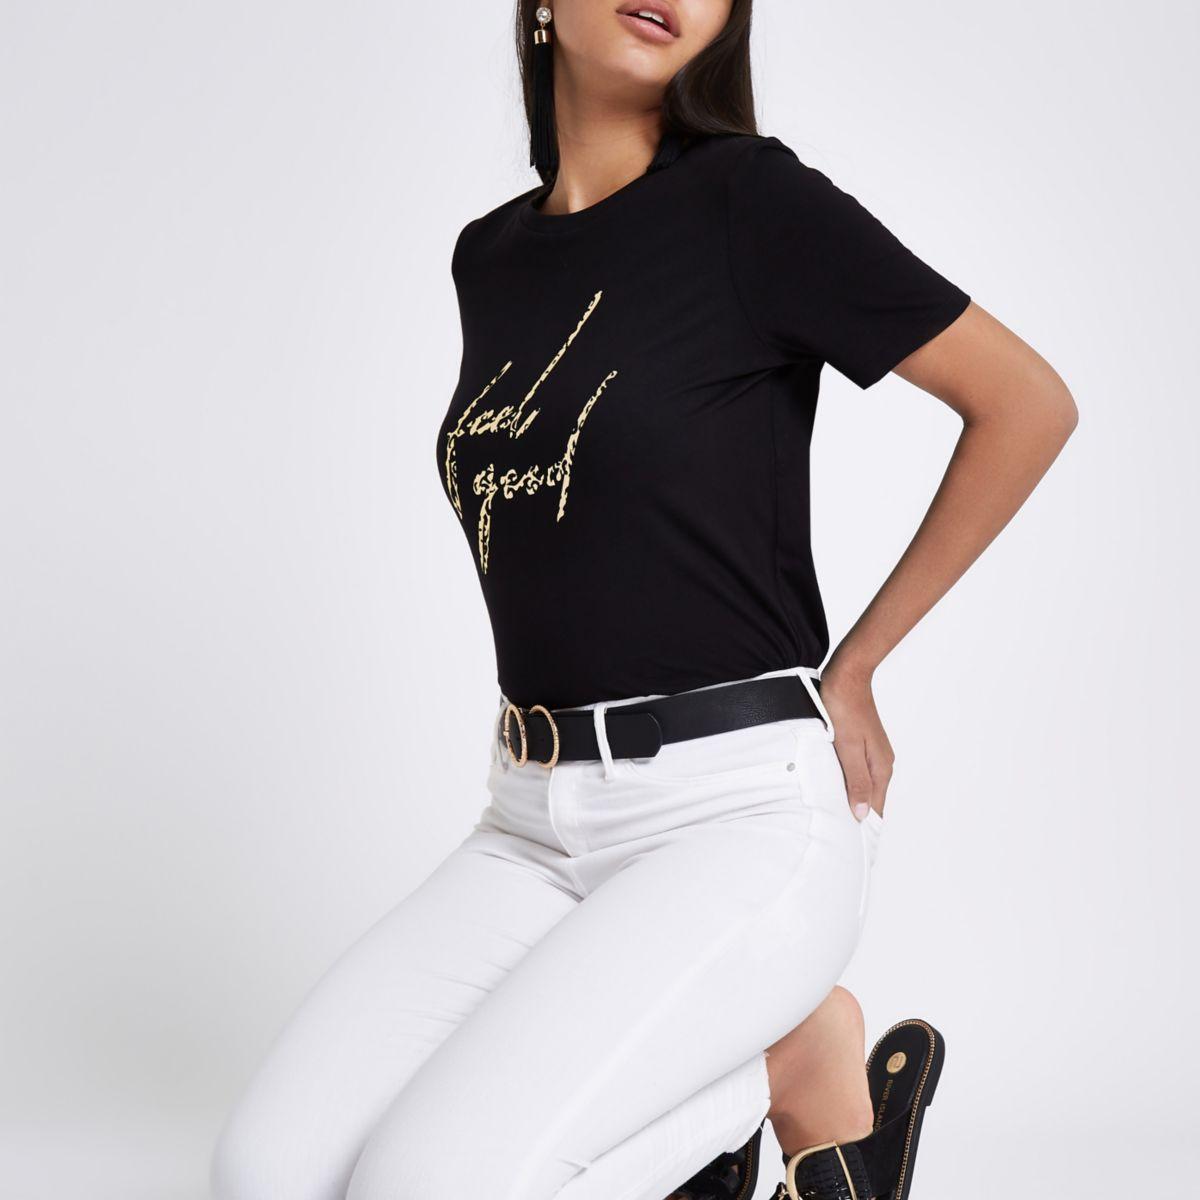 Black 'feel good' leopard print T-shirt